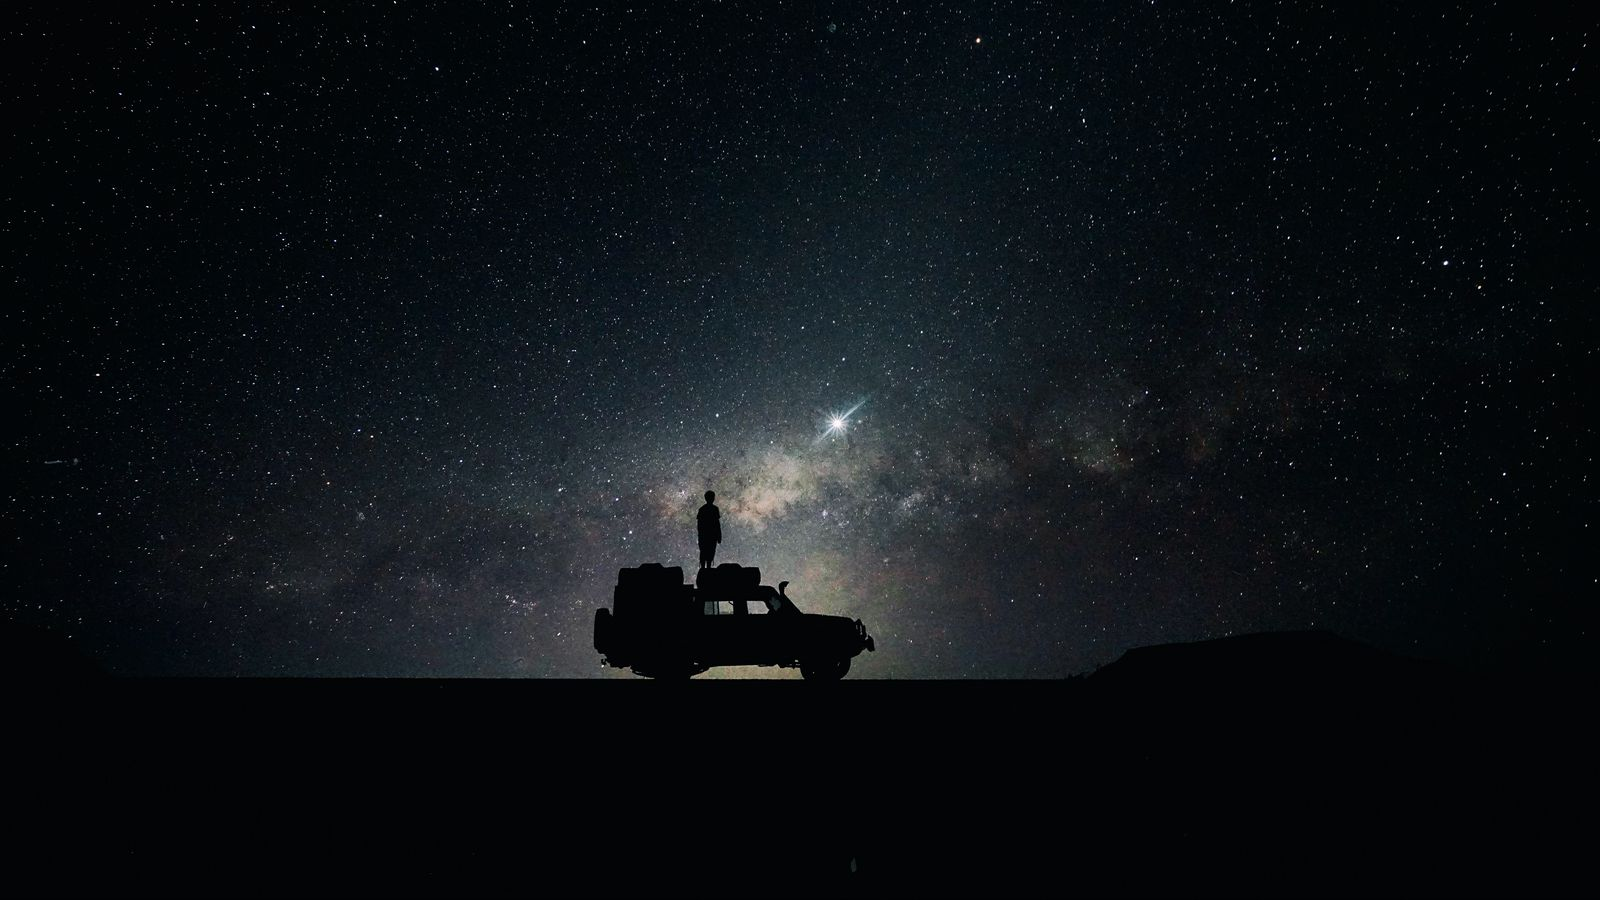 1600x900 Wallpaper stars, sky, space, car